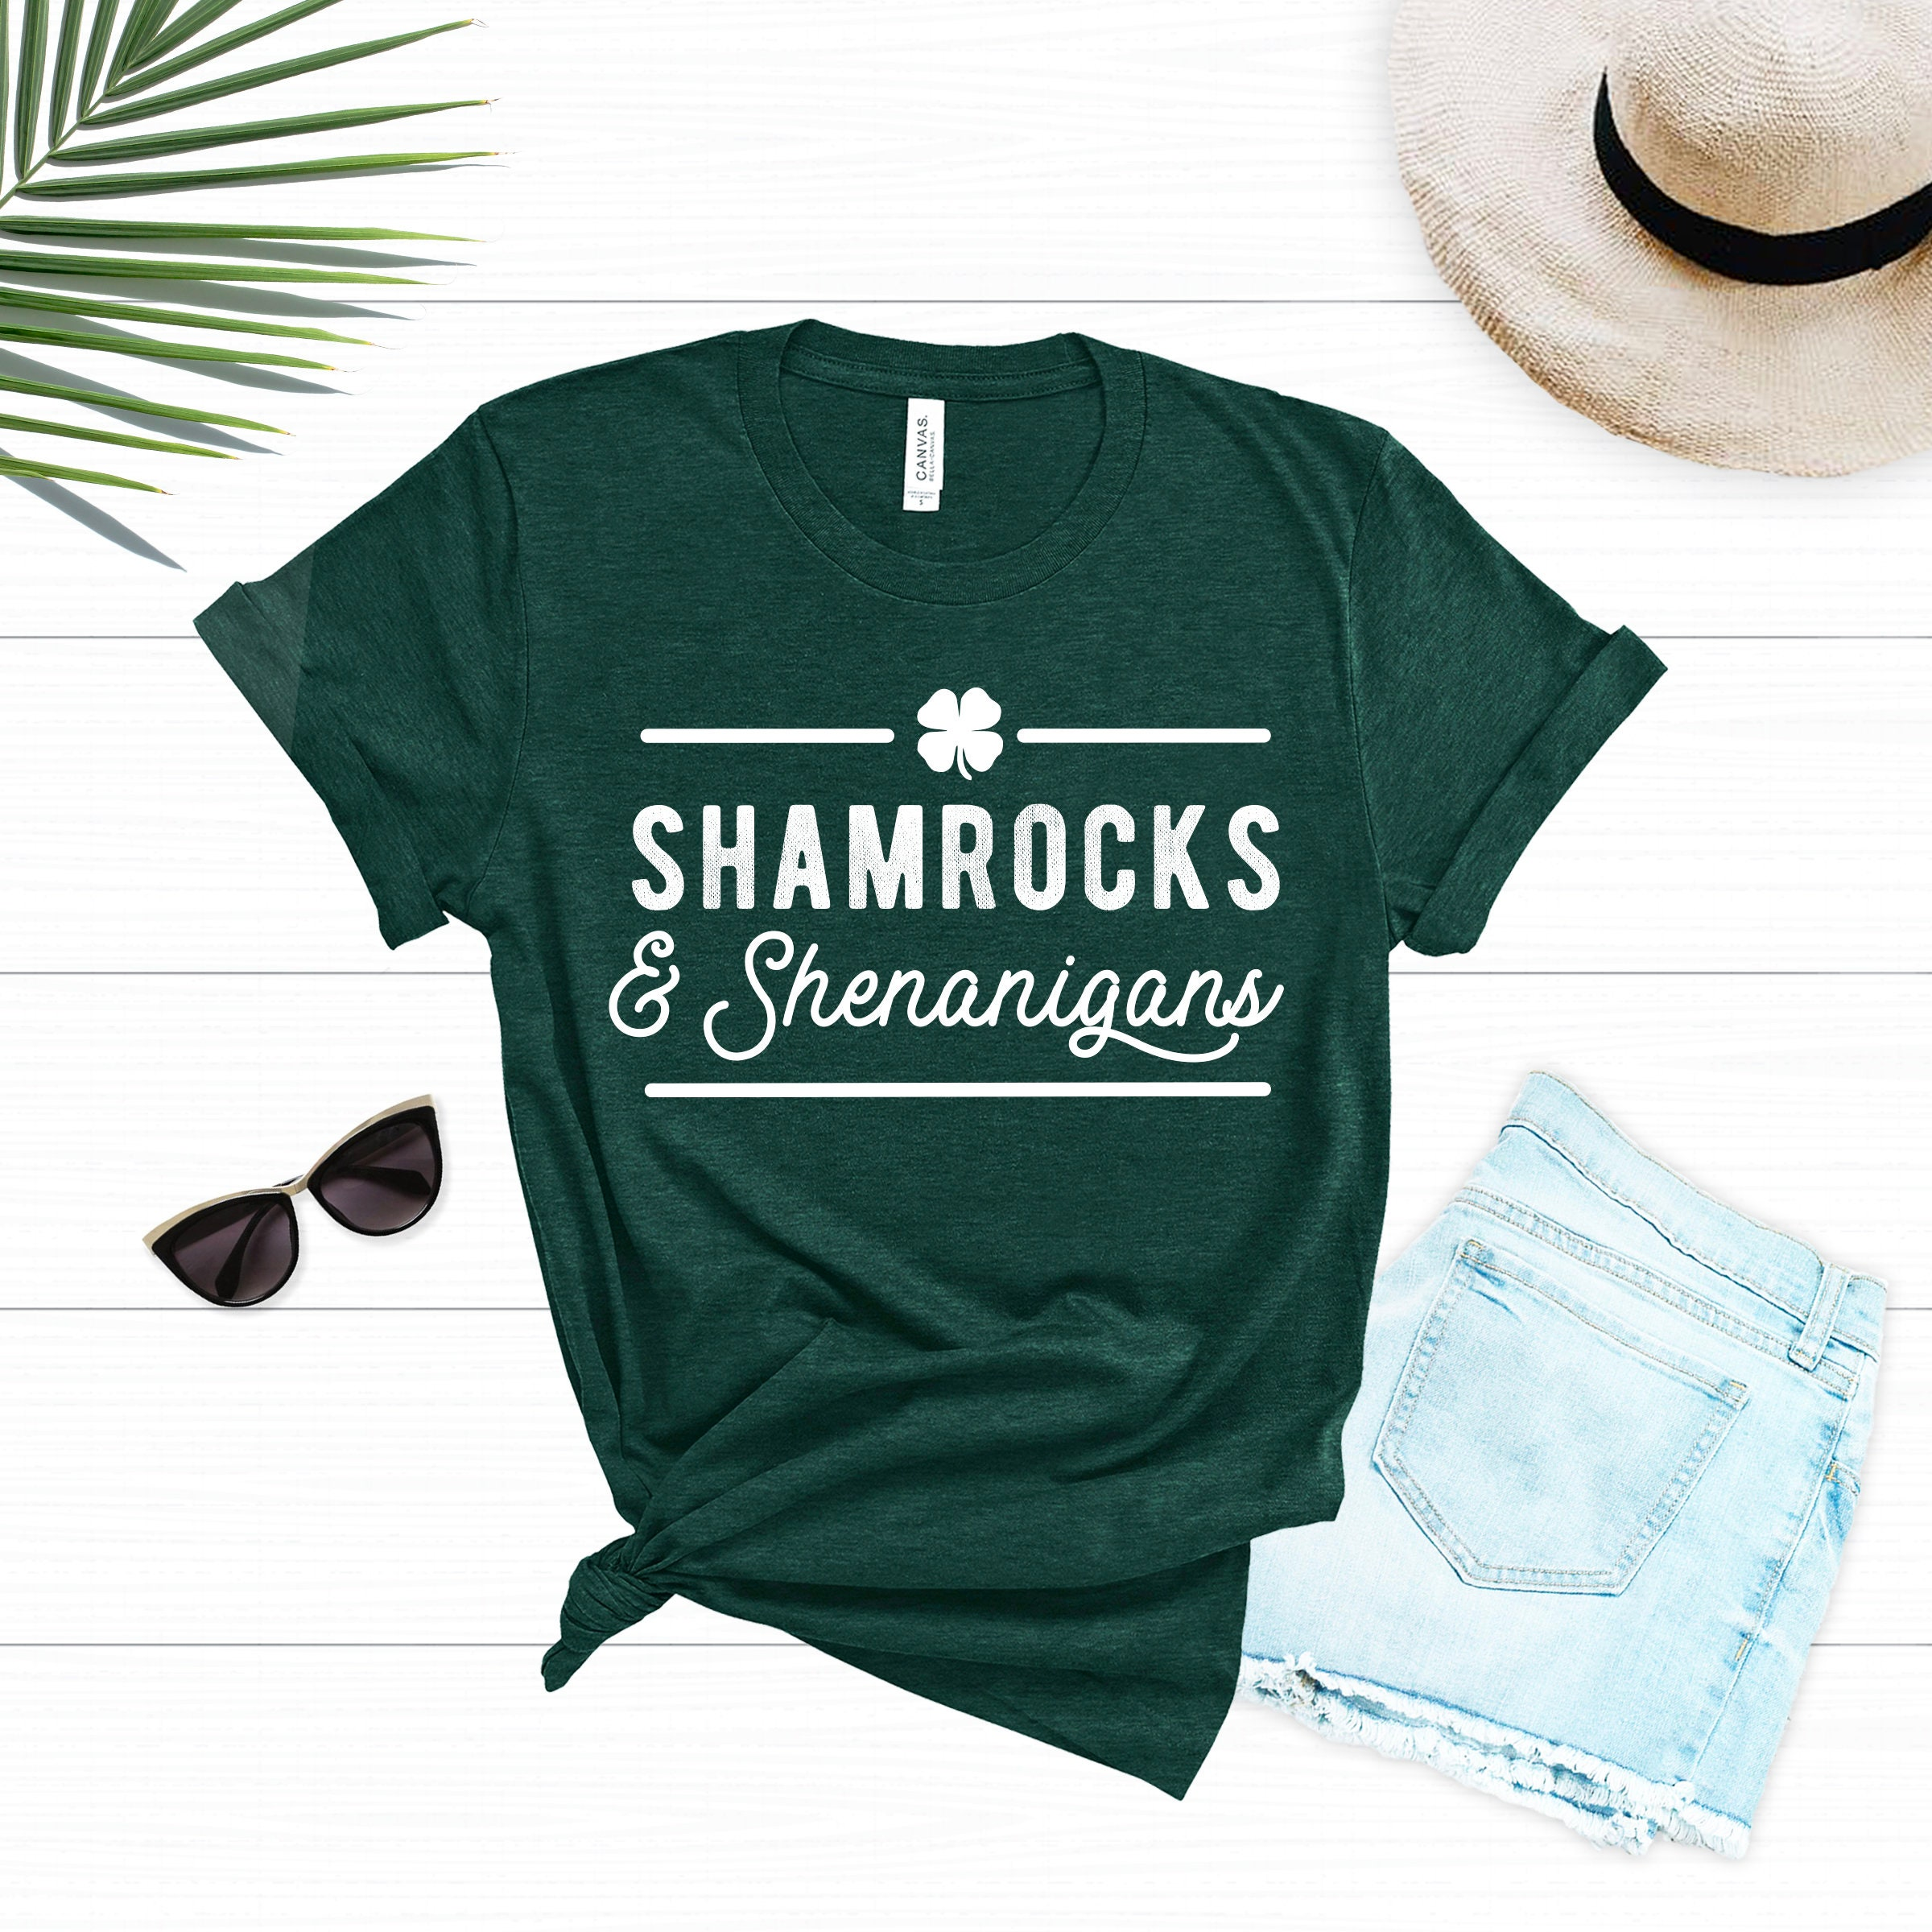 e14db87ce St Patricks Day Shirt Women St Patricks Day Shamrock Shirt | Etsy